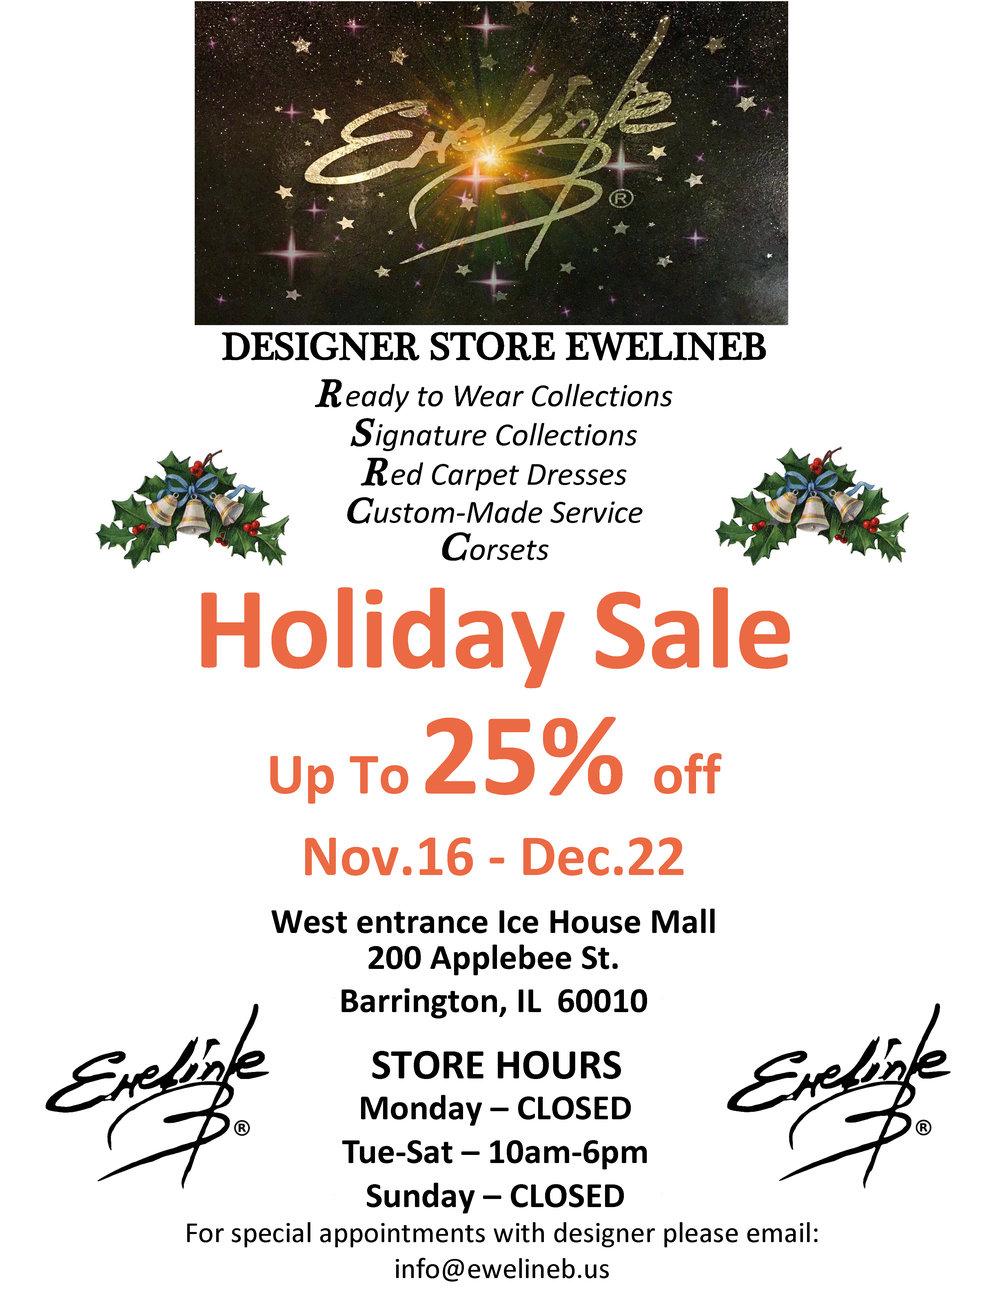 EwelineB Holiday Nov.16-Dec.22Salever2.jpg